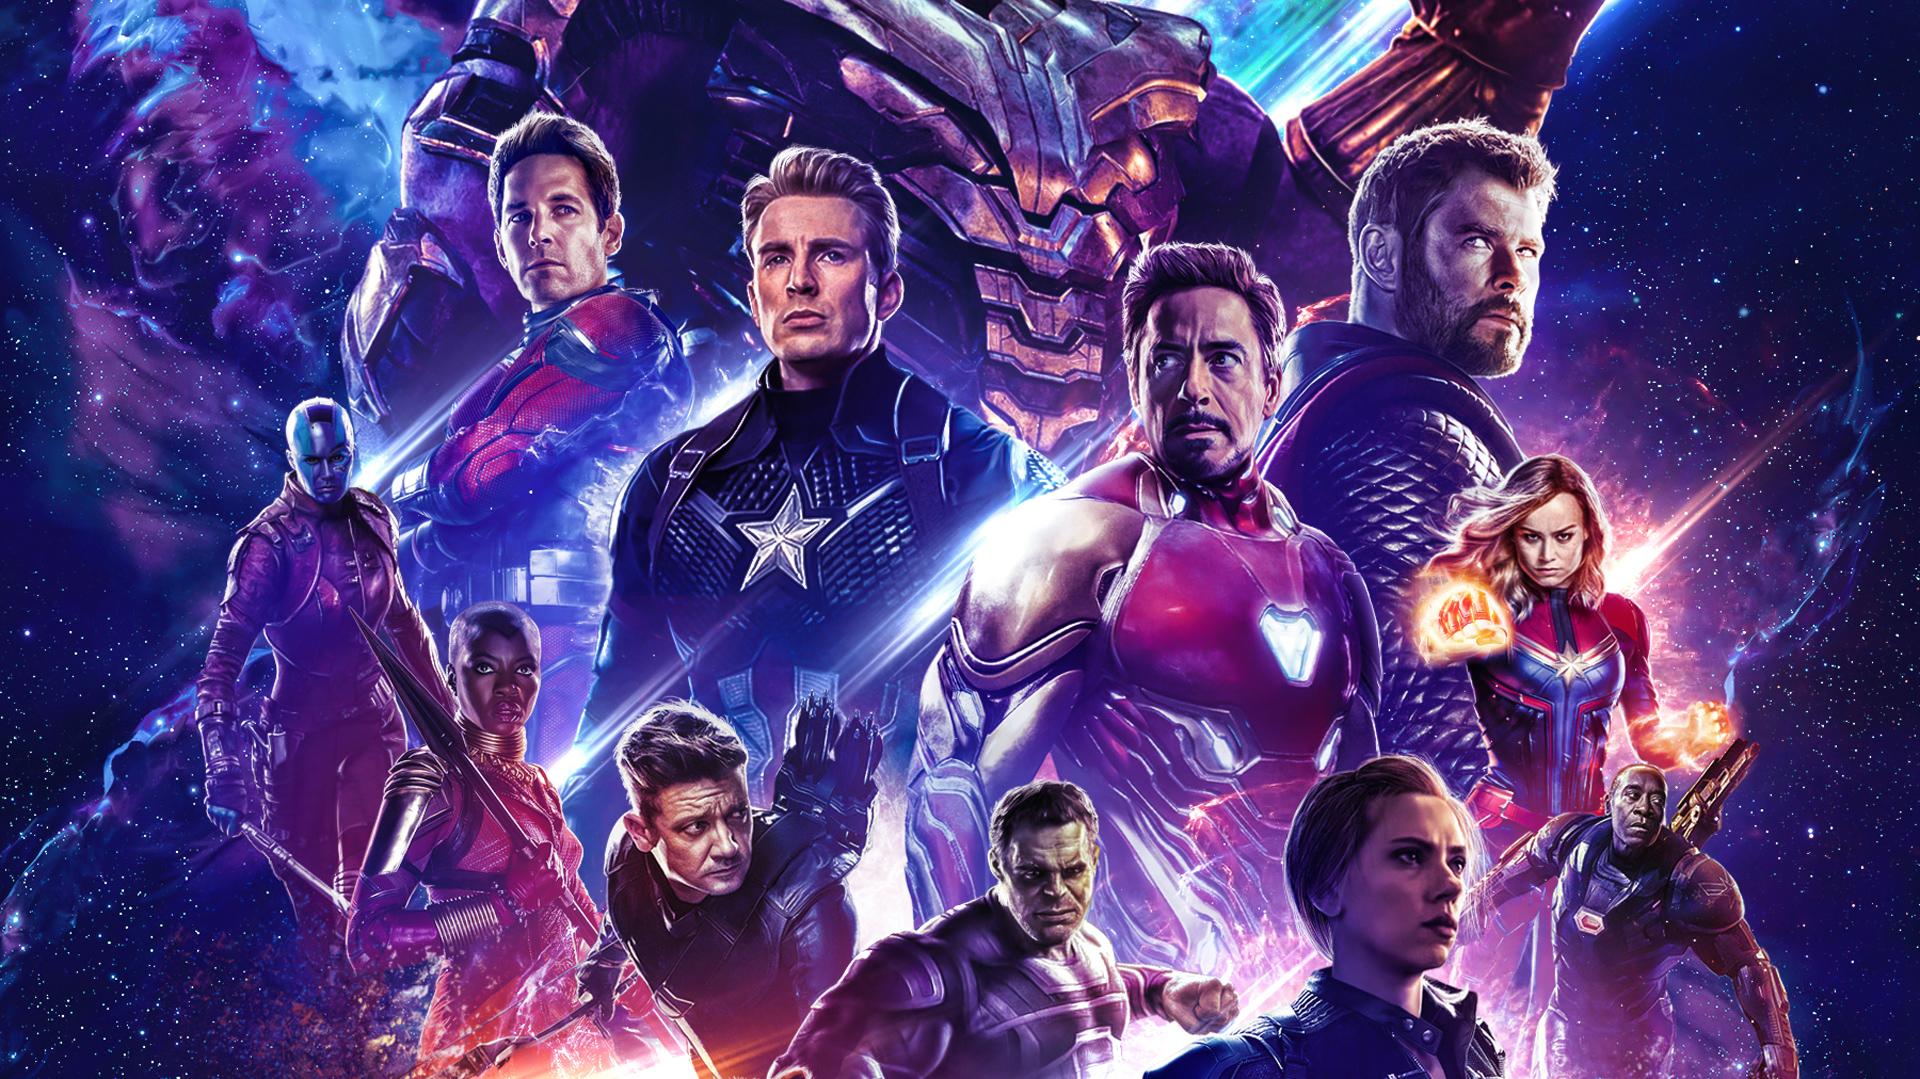 2048x2048 Anthem Ipad Air Hd 4k Wallpapers Images: 2048x2048 Poster Avengers Endgame 2019 Ipad Air HD 4k